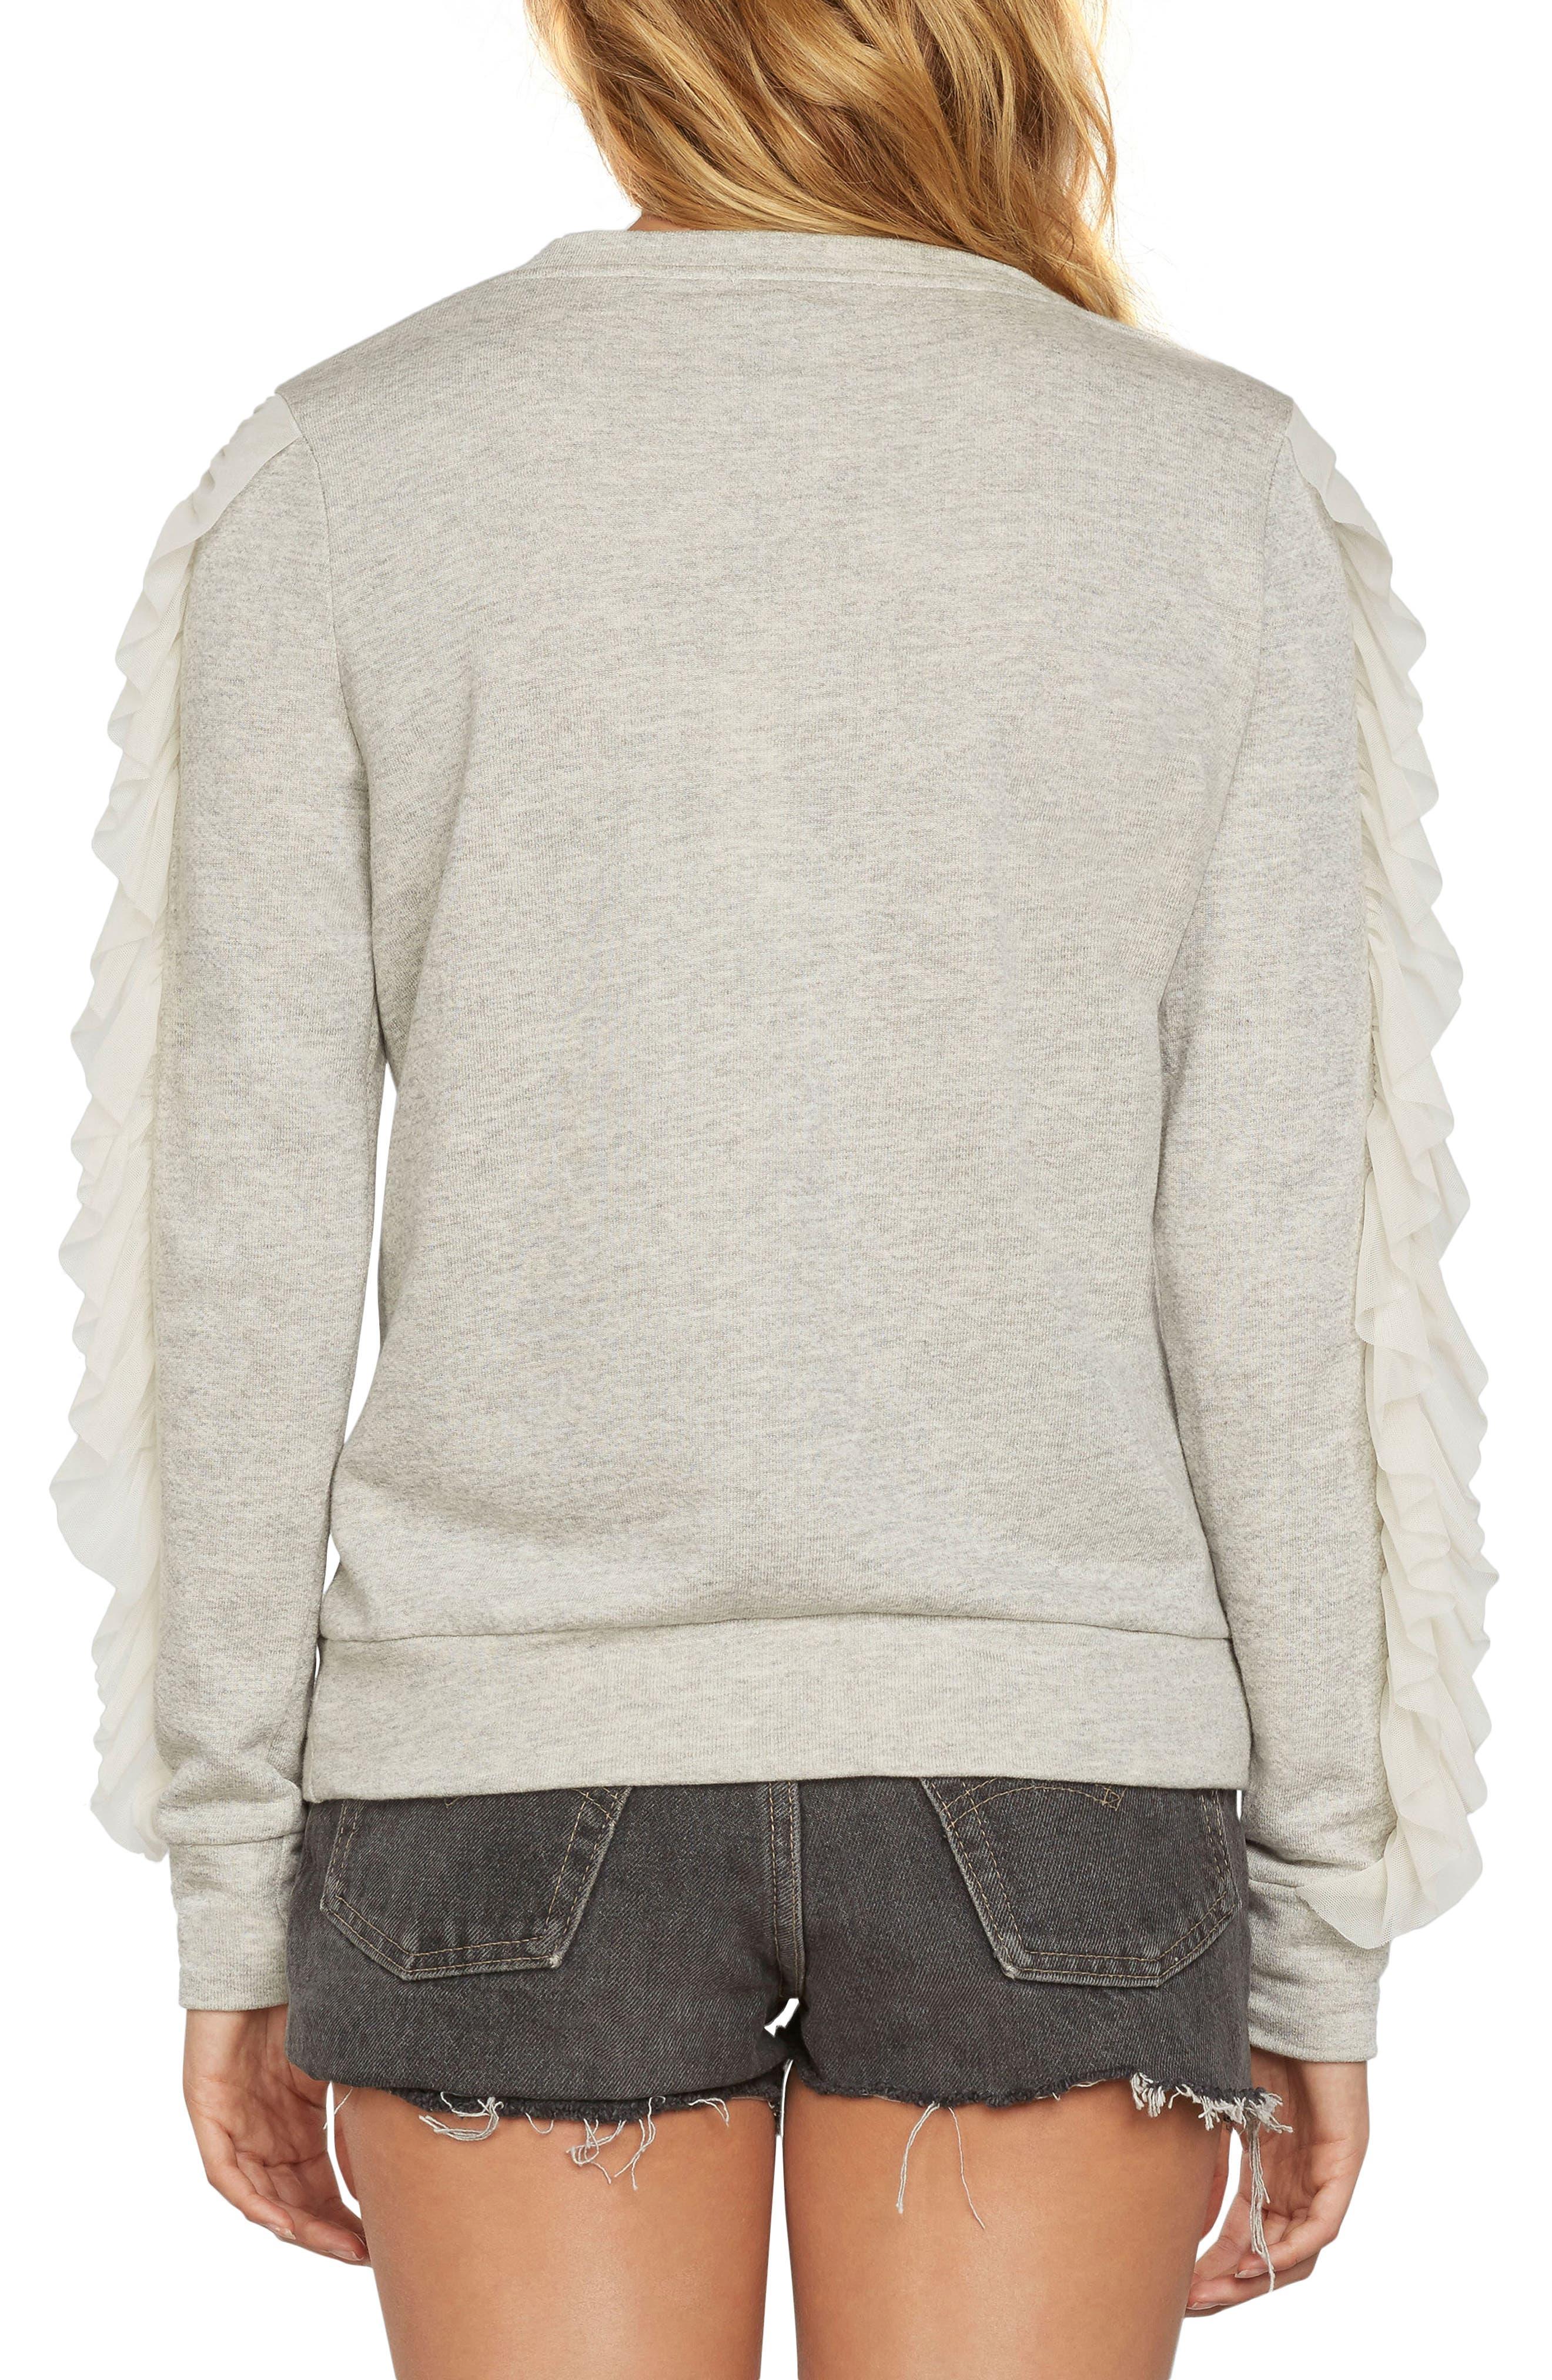 Ruffle Pullover Knit Sweatshirt,                             Alternate thumbnail 2, color,                             Heather Grey